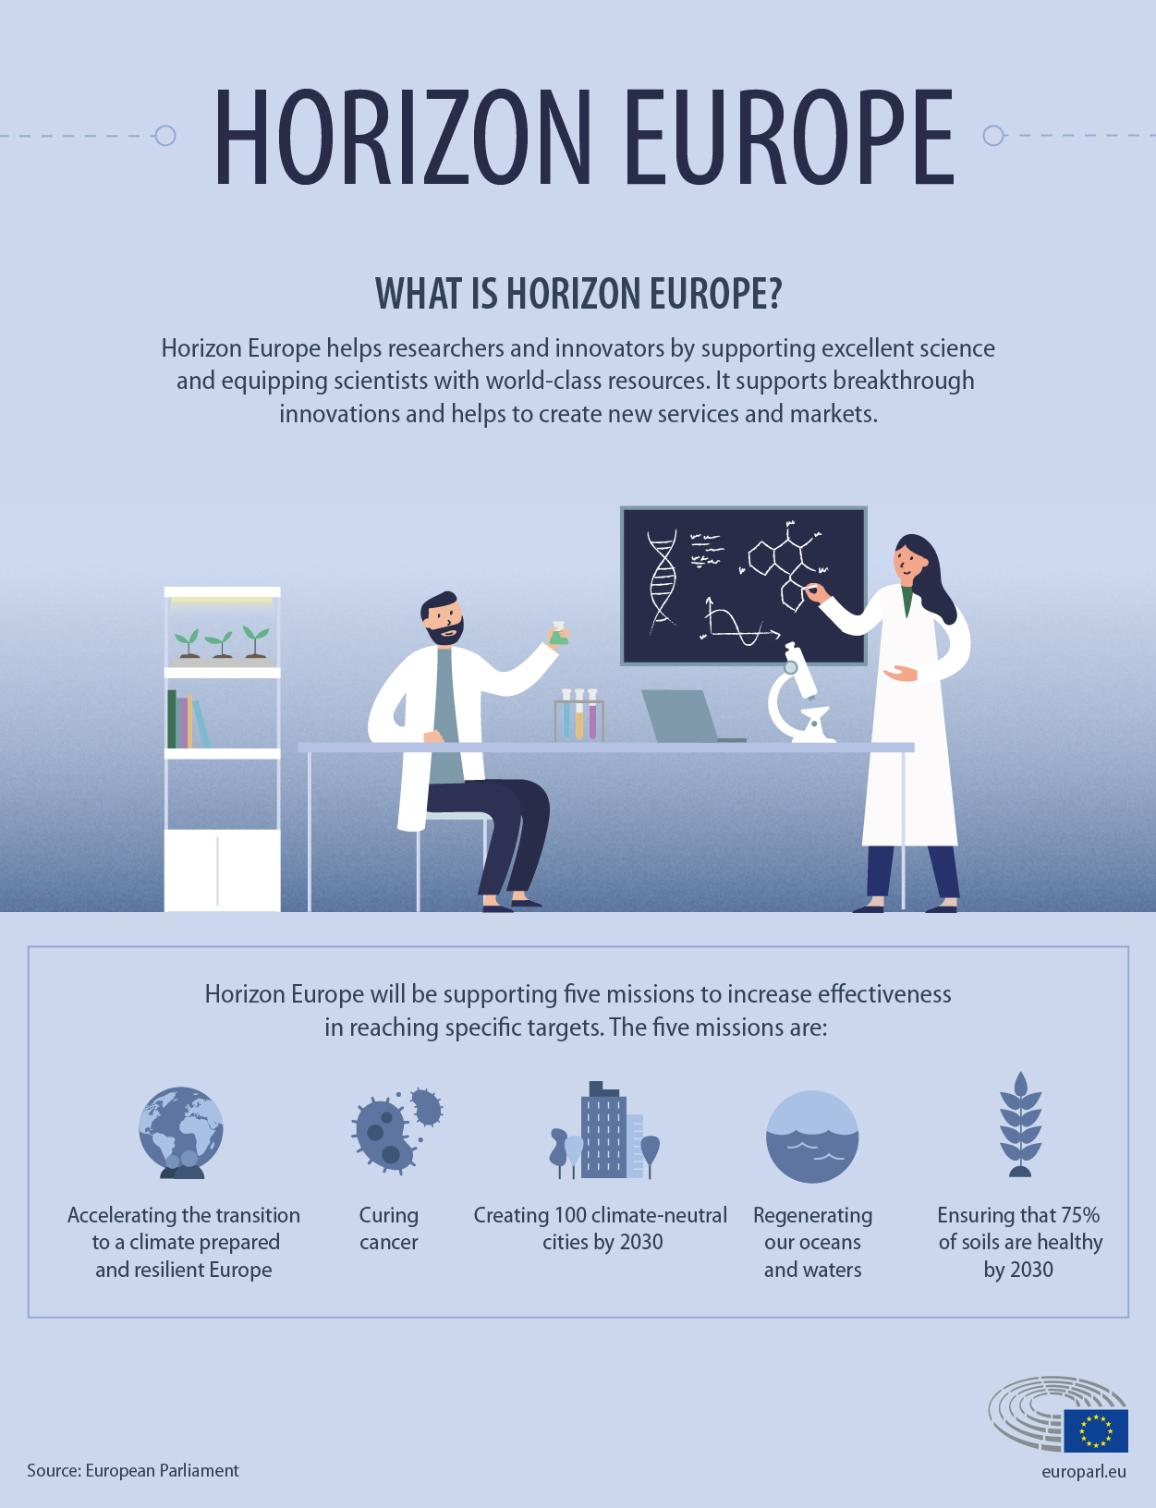 Infographic explaining Horizon Europe